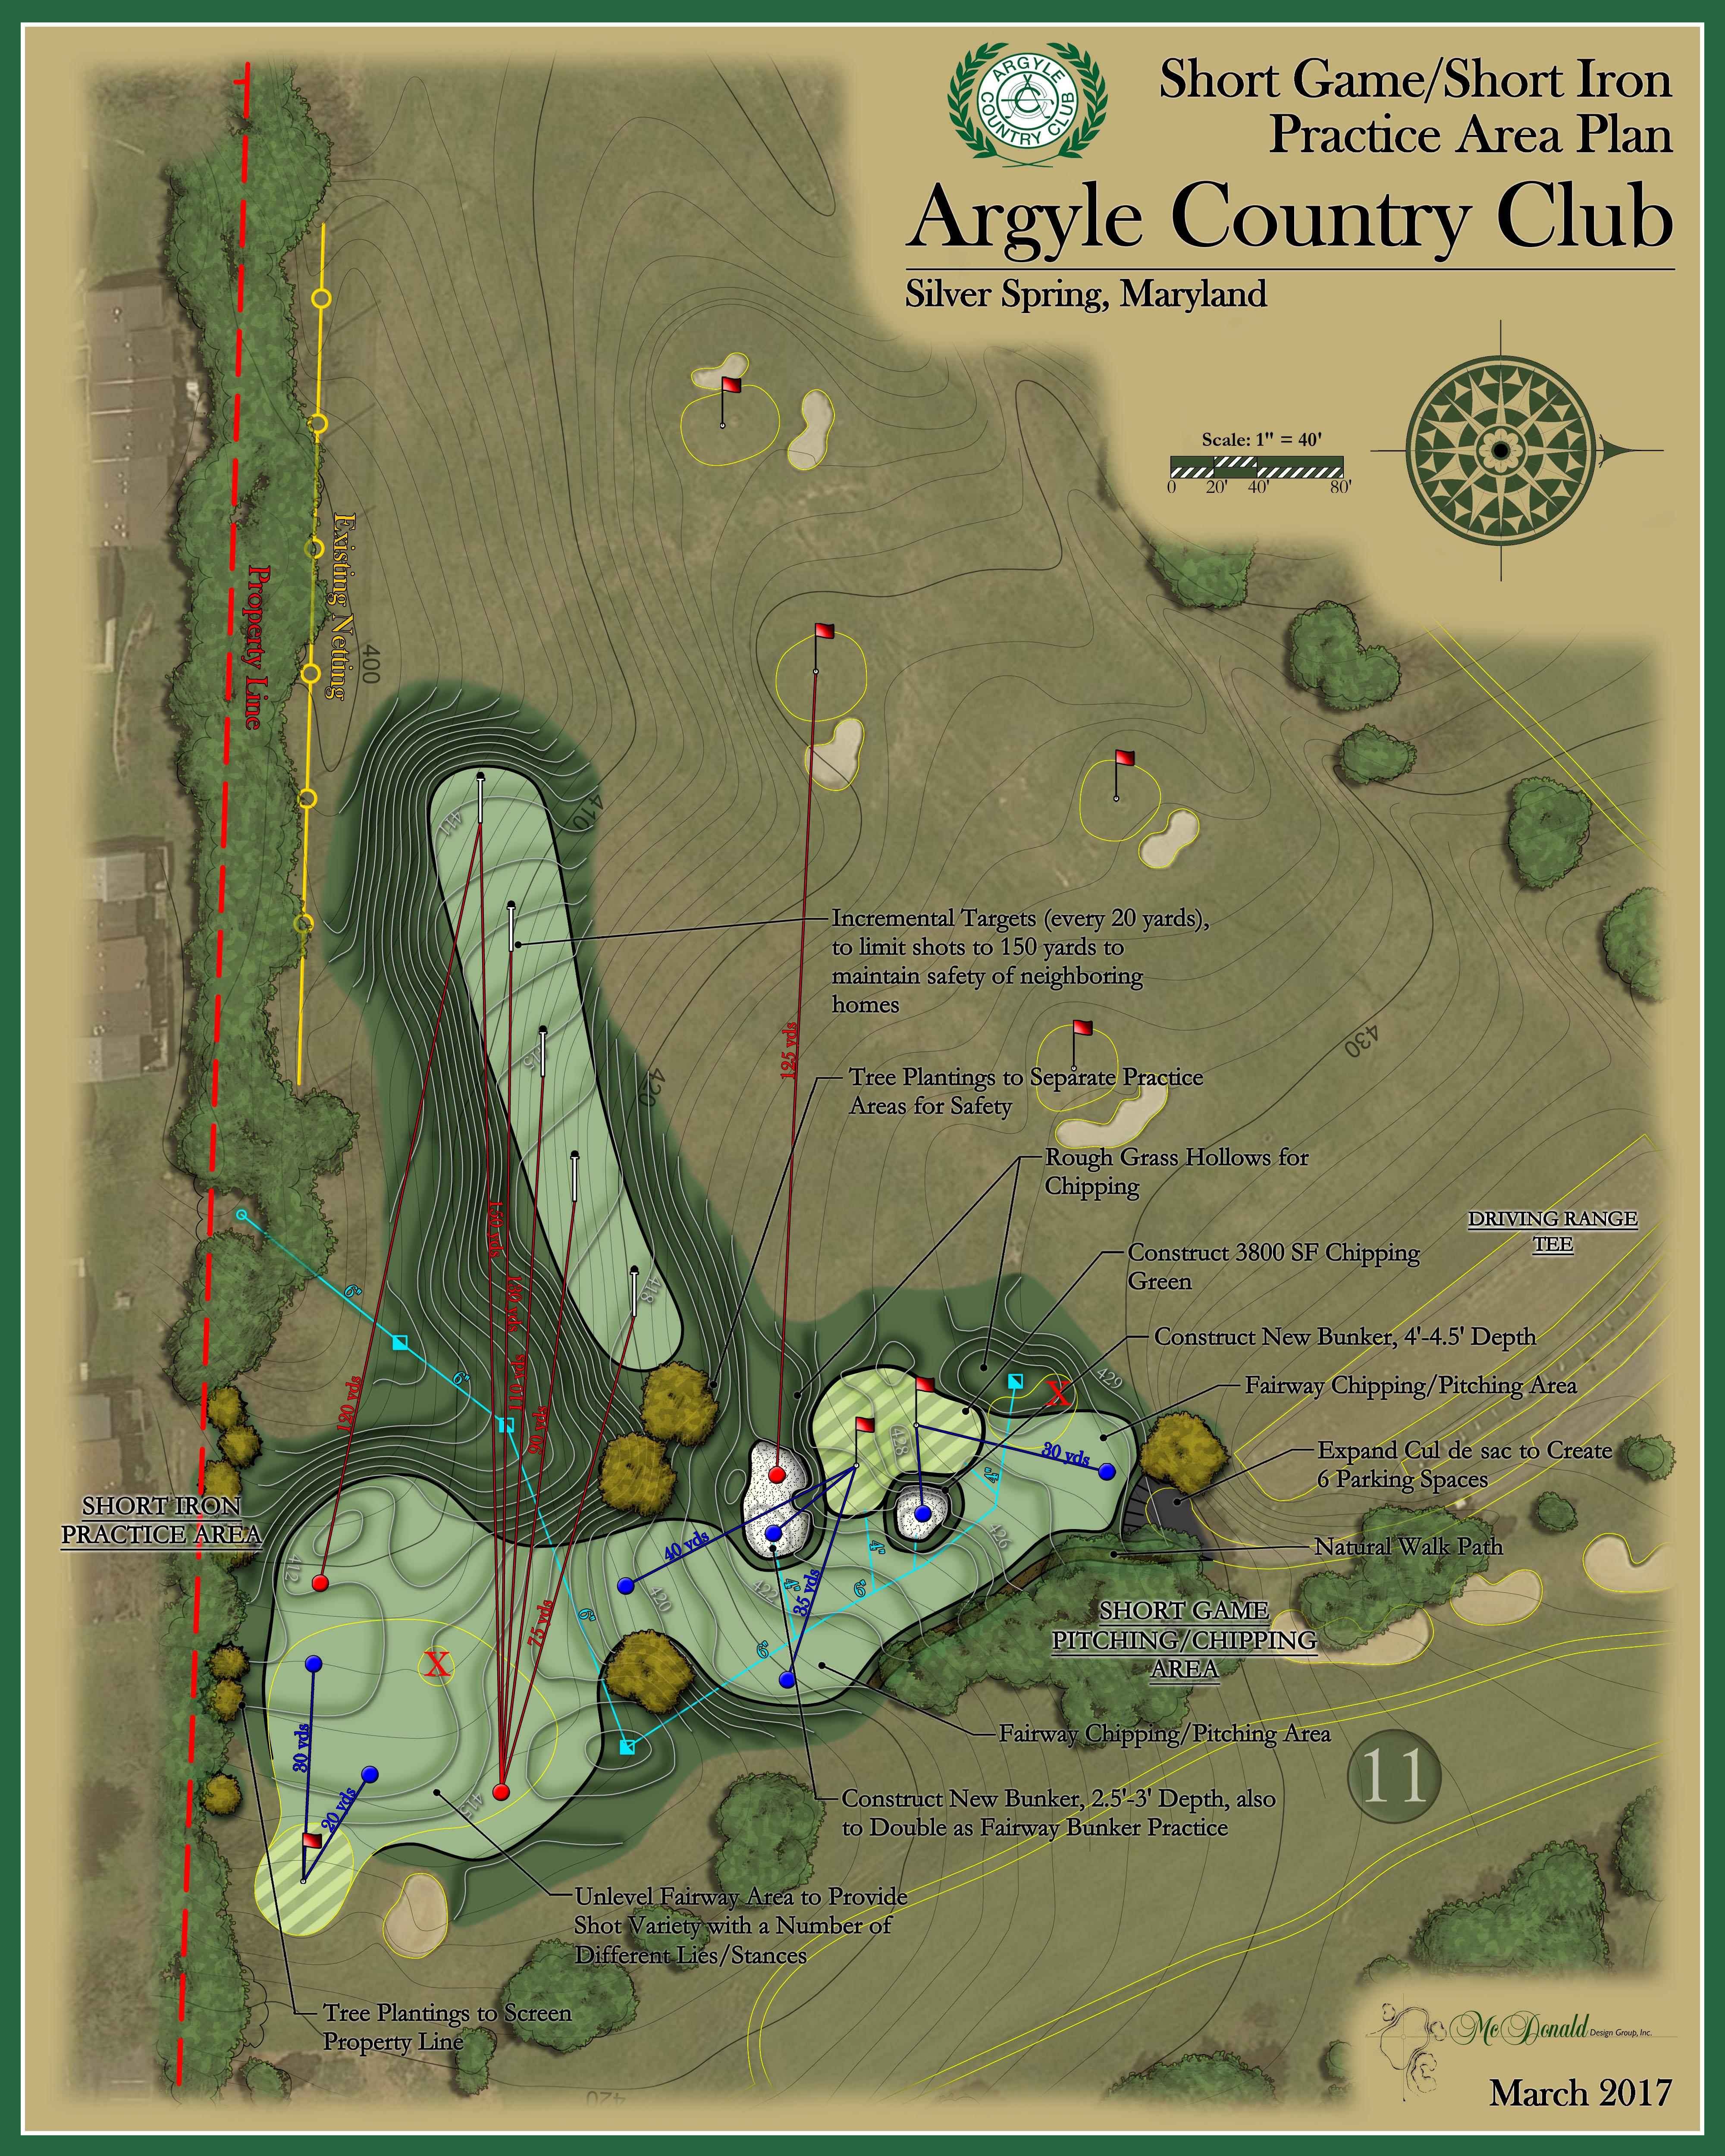 Argyle Country Club<br/>Practice Facility Design